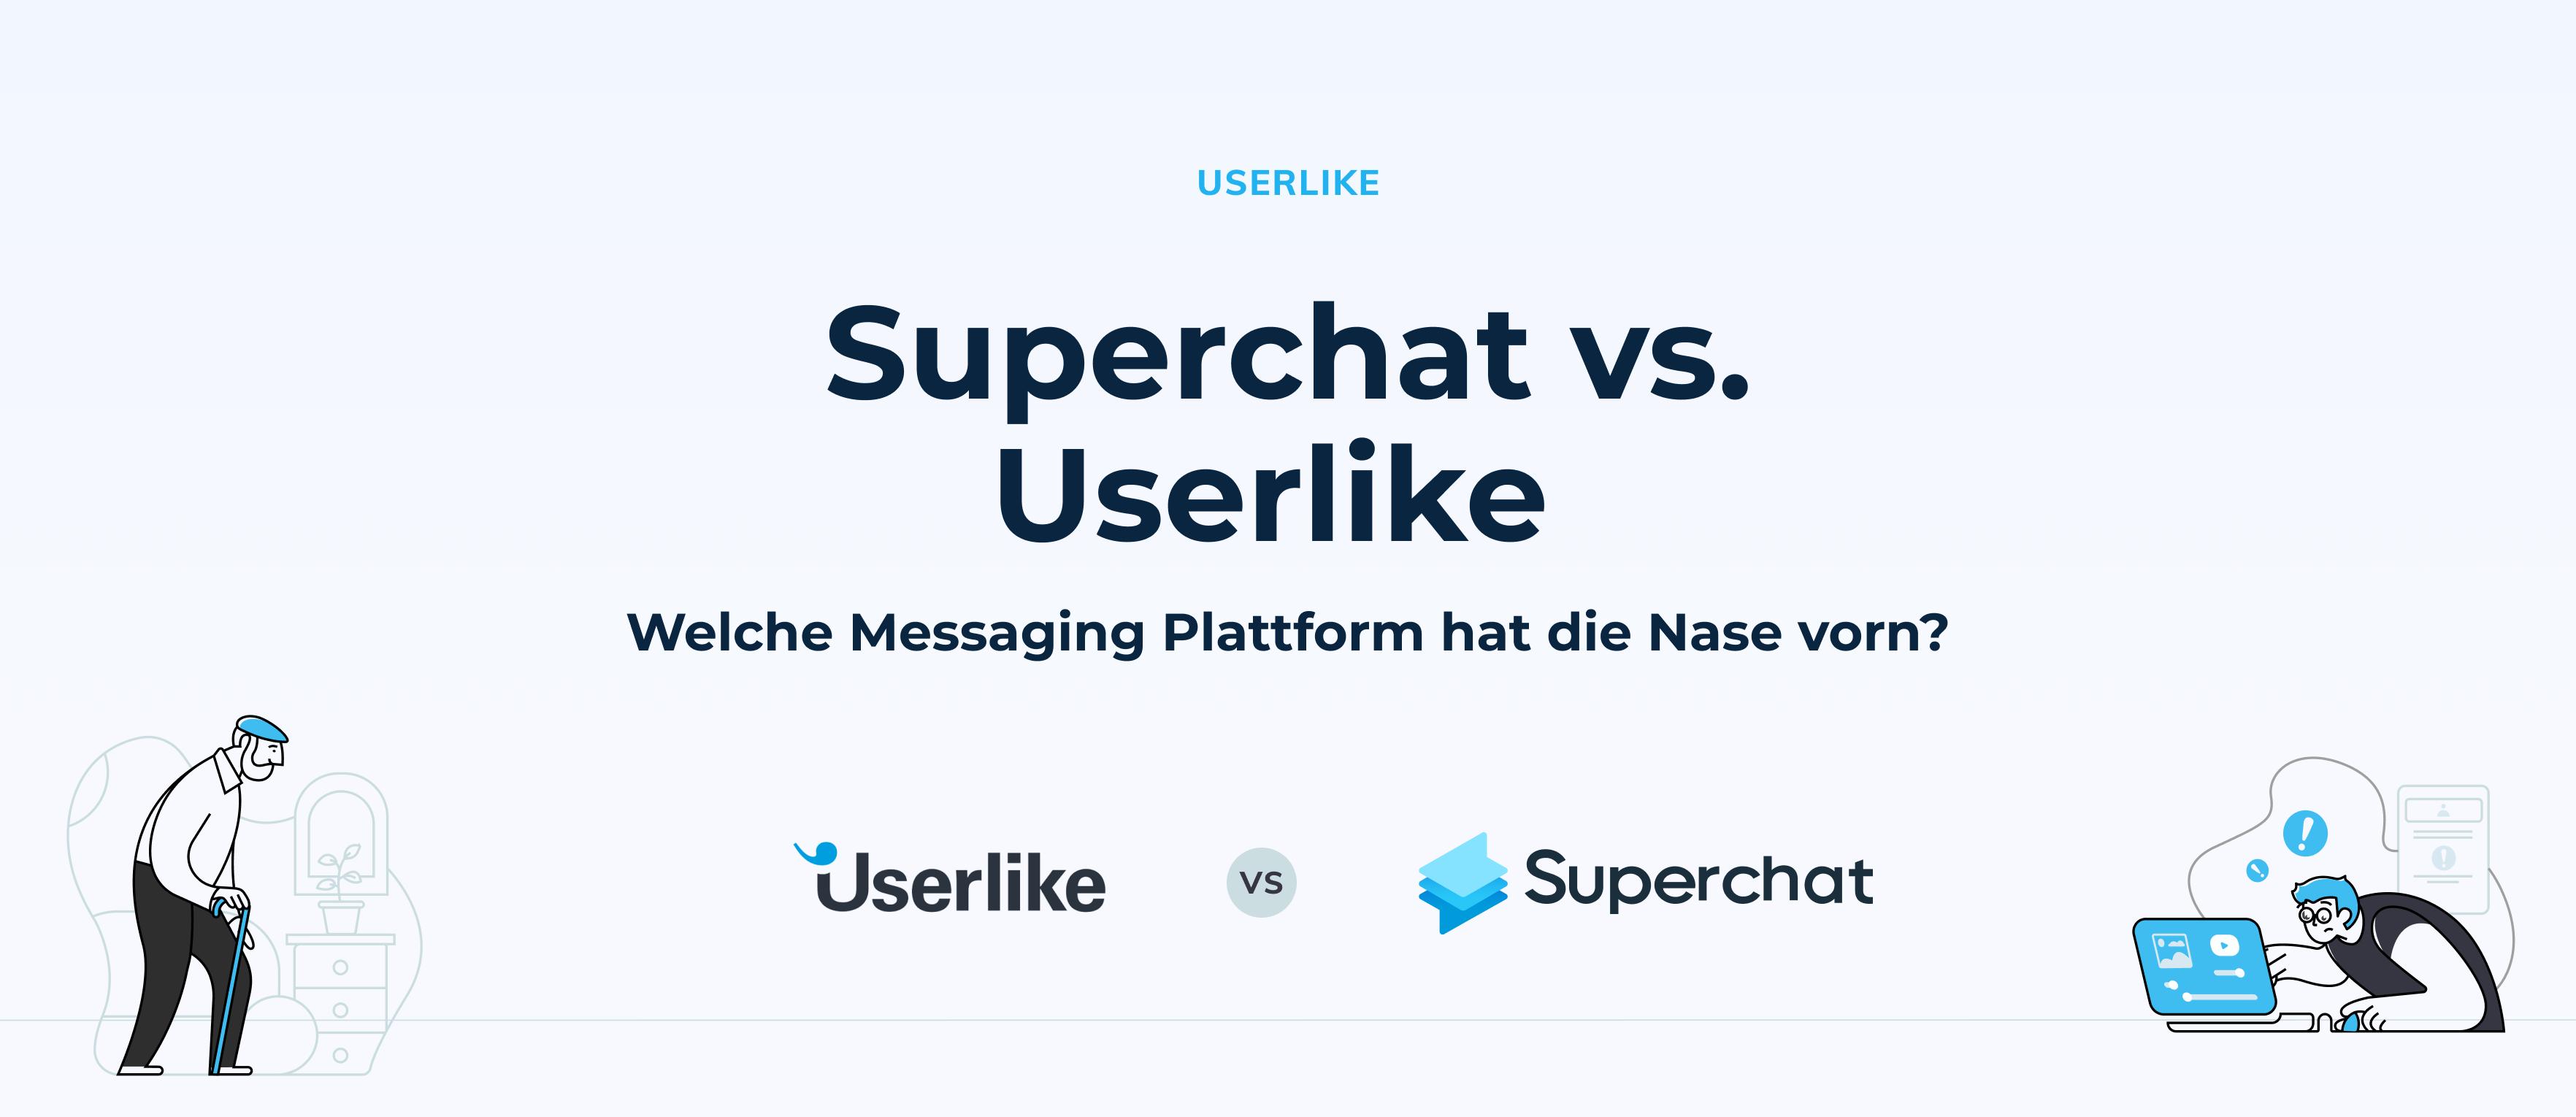 Superchat im Vergleich: Superchat vs. Userlike